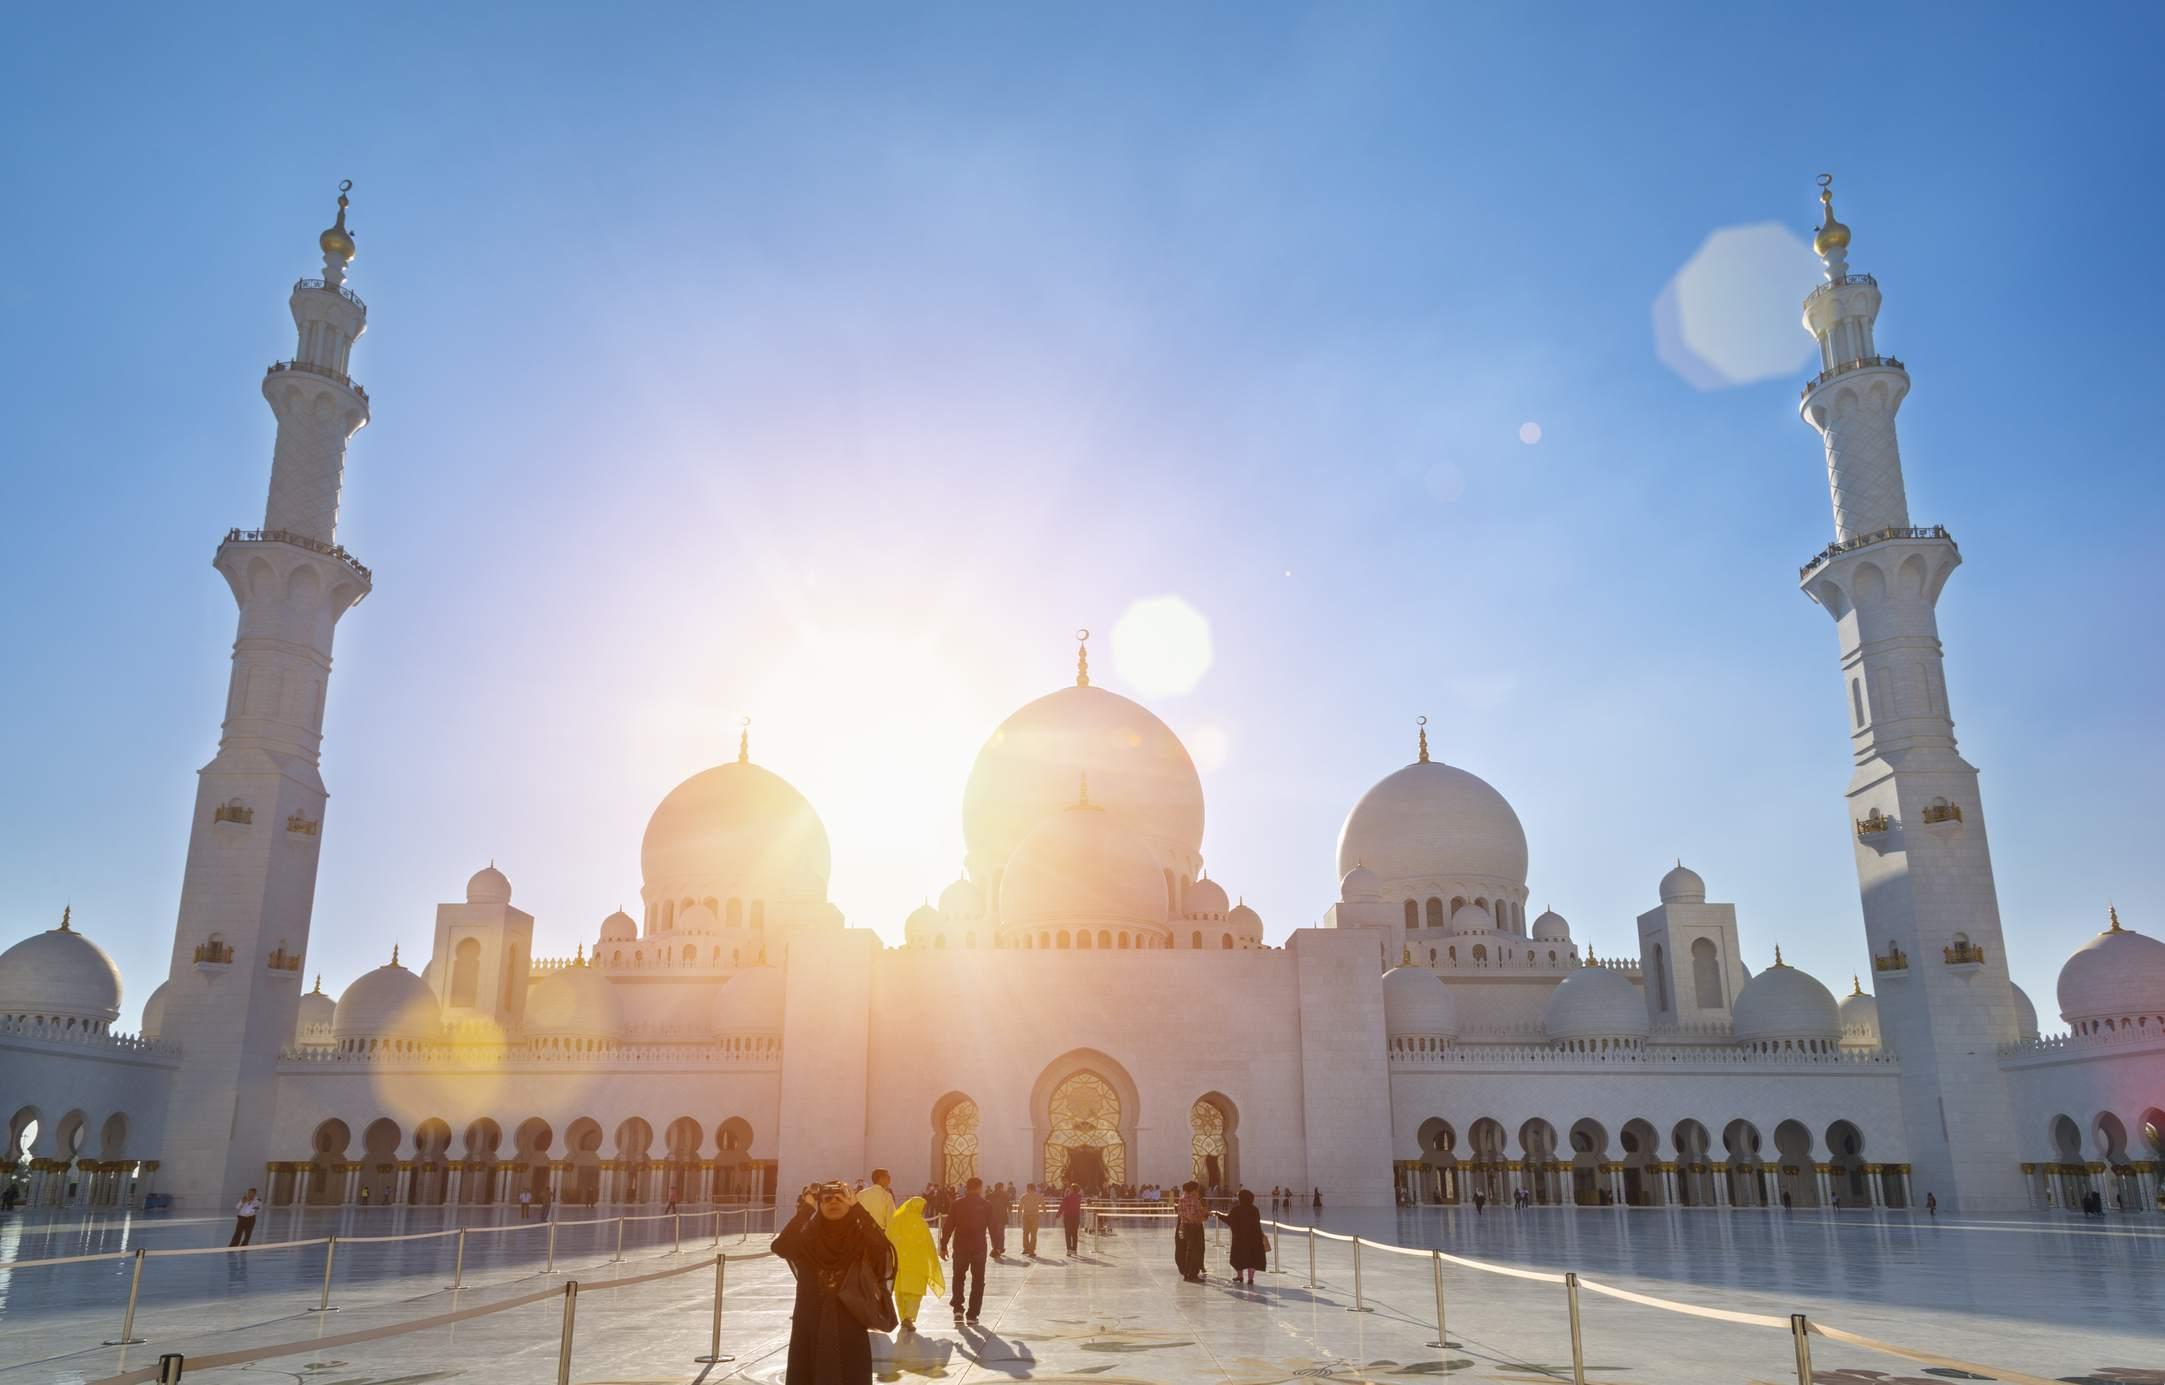 Abu Dhabi Grand Mosque, Sheikh Zayed Mosque